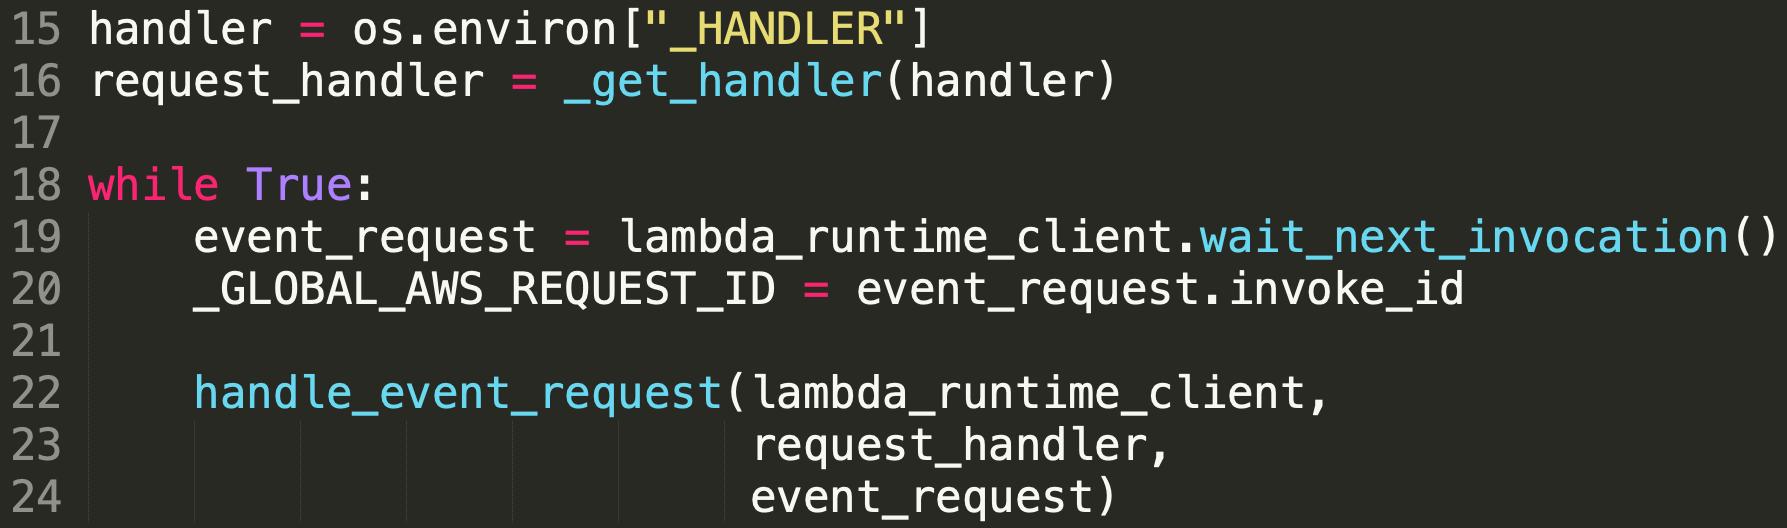 umair-akbar-lambda poc 7 bootstrap 4 - Gaining Persistency on Vulnerable Lambdas